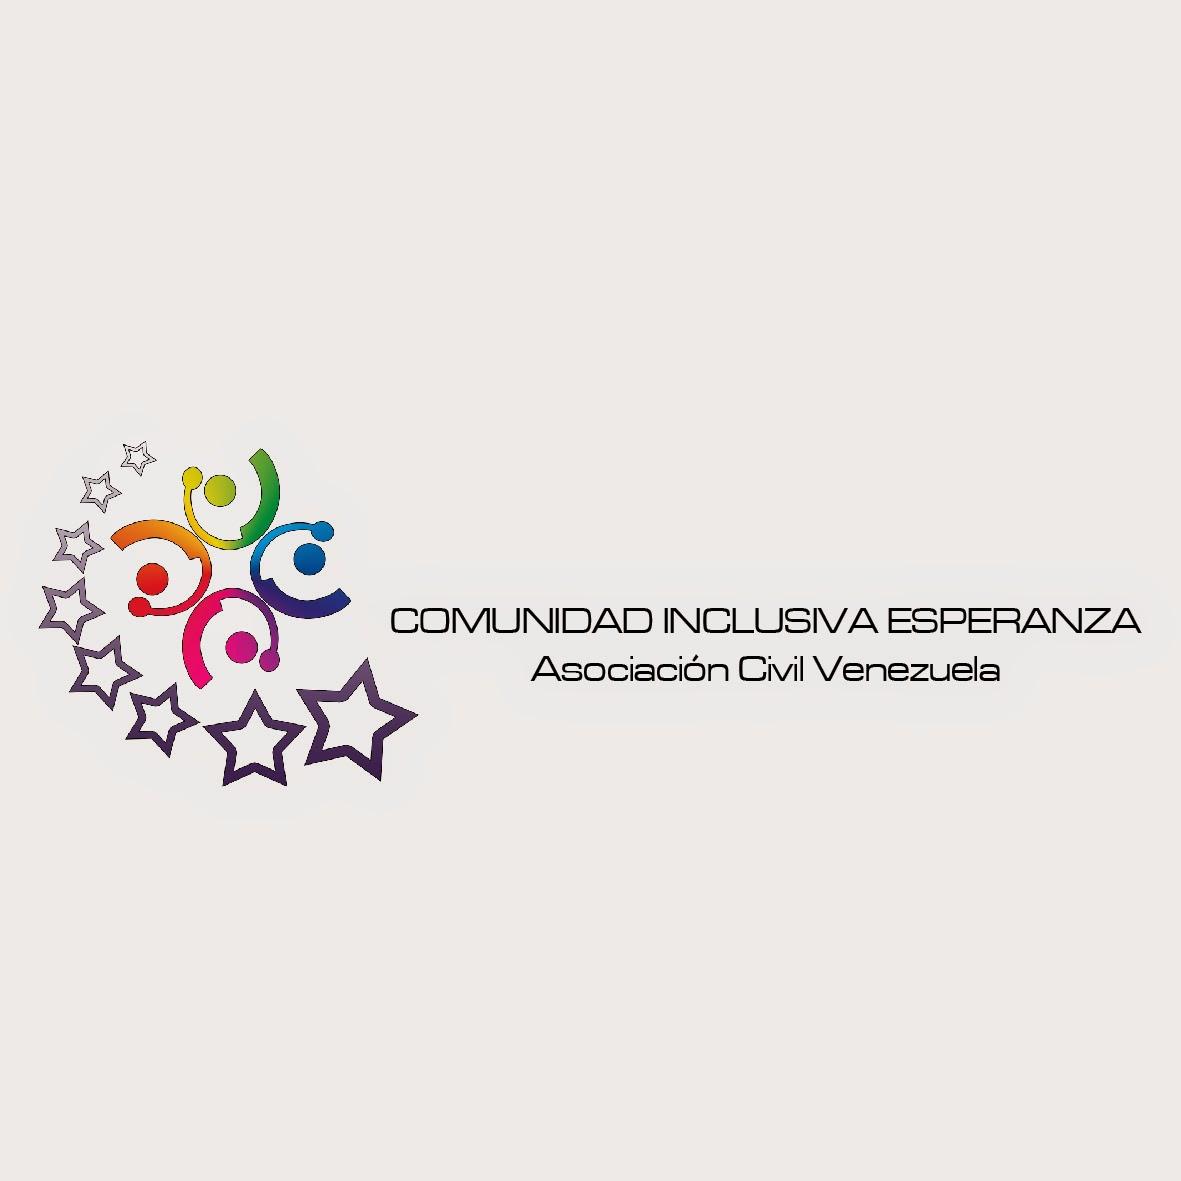 LOGO COMUNIDAD INCLUSIVA ESPERANZA A.C